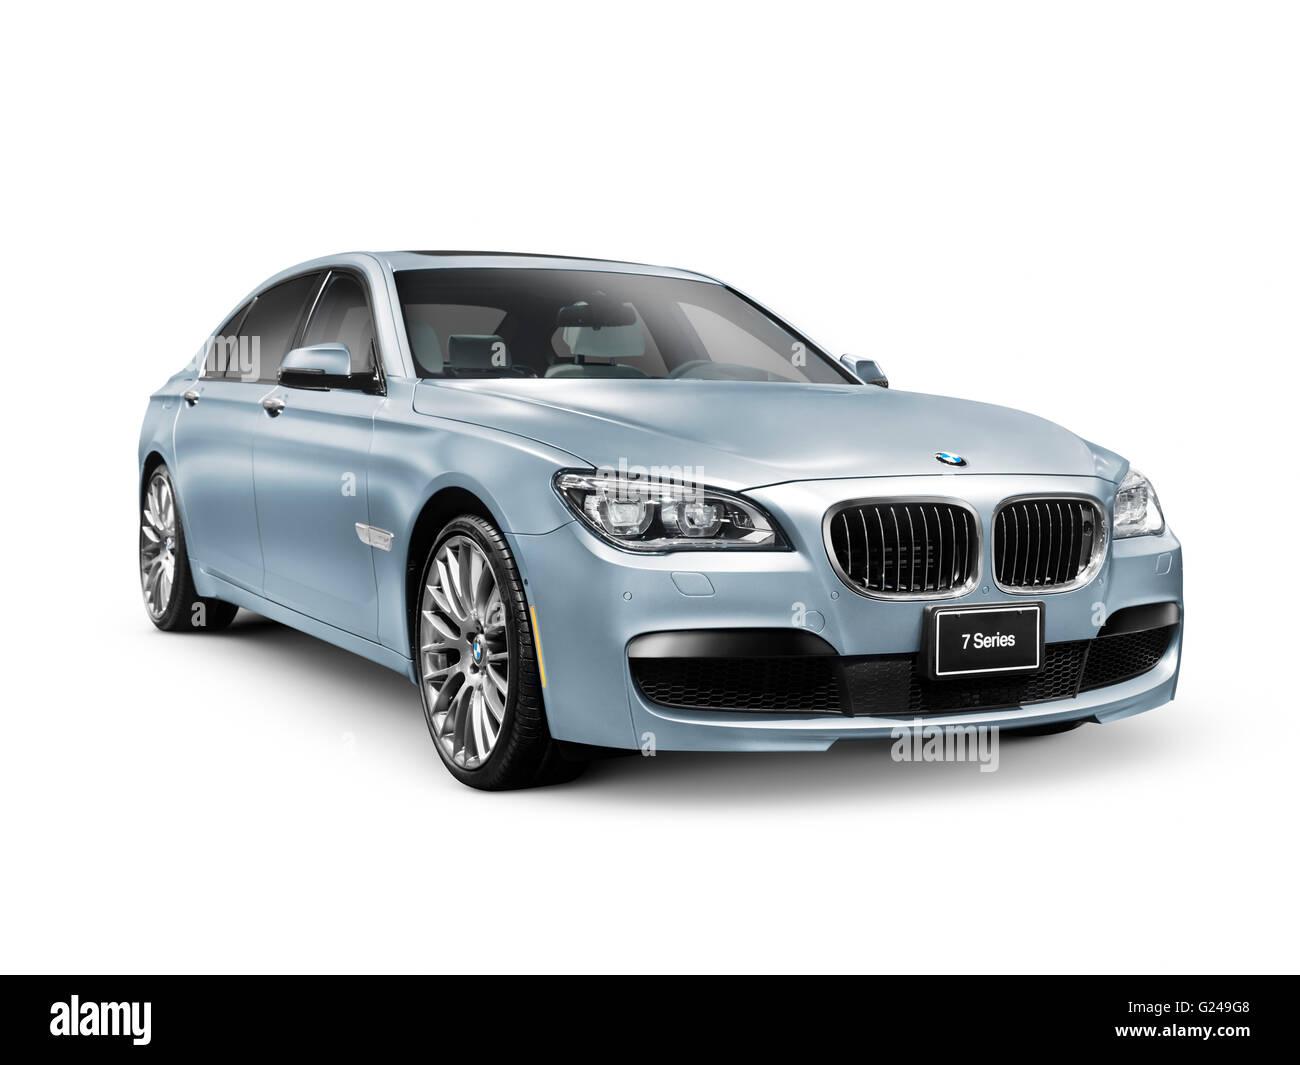 Blue 2014 BMW 750Li XDrive sedan luxury car - Stock Image